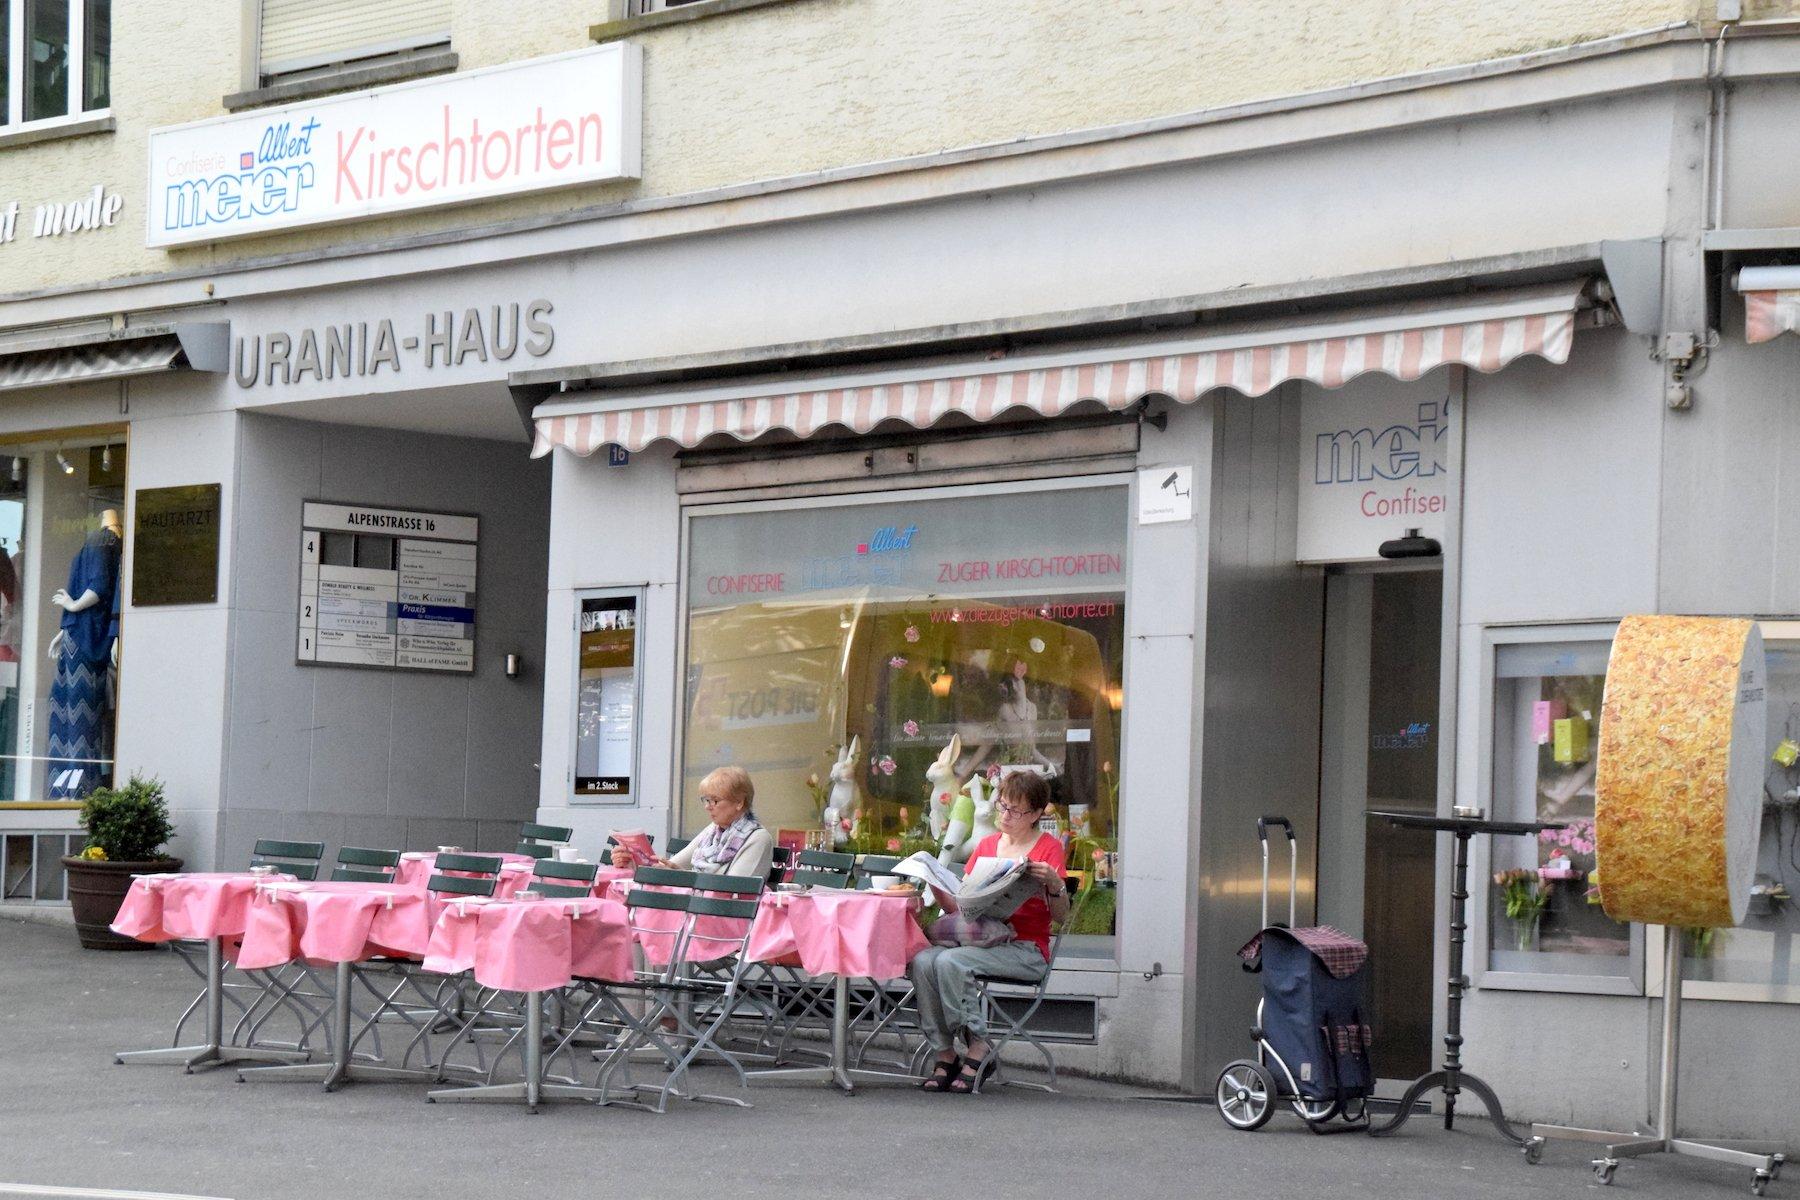 Confiserie Albert Meier im Urania Haus beim Bahnhof Zug.